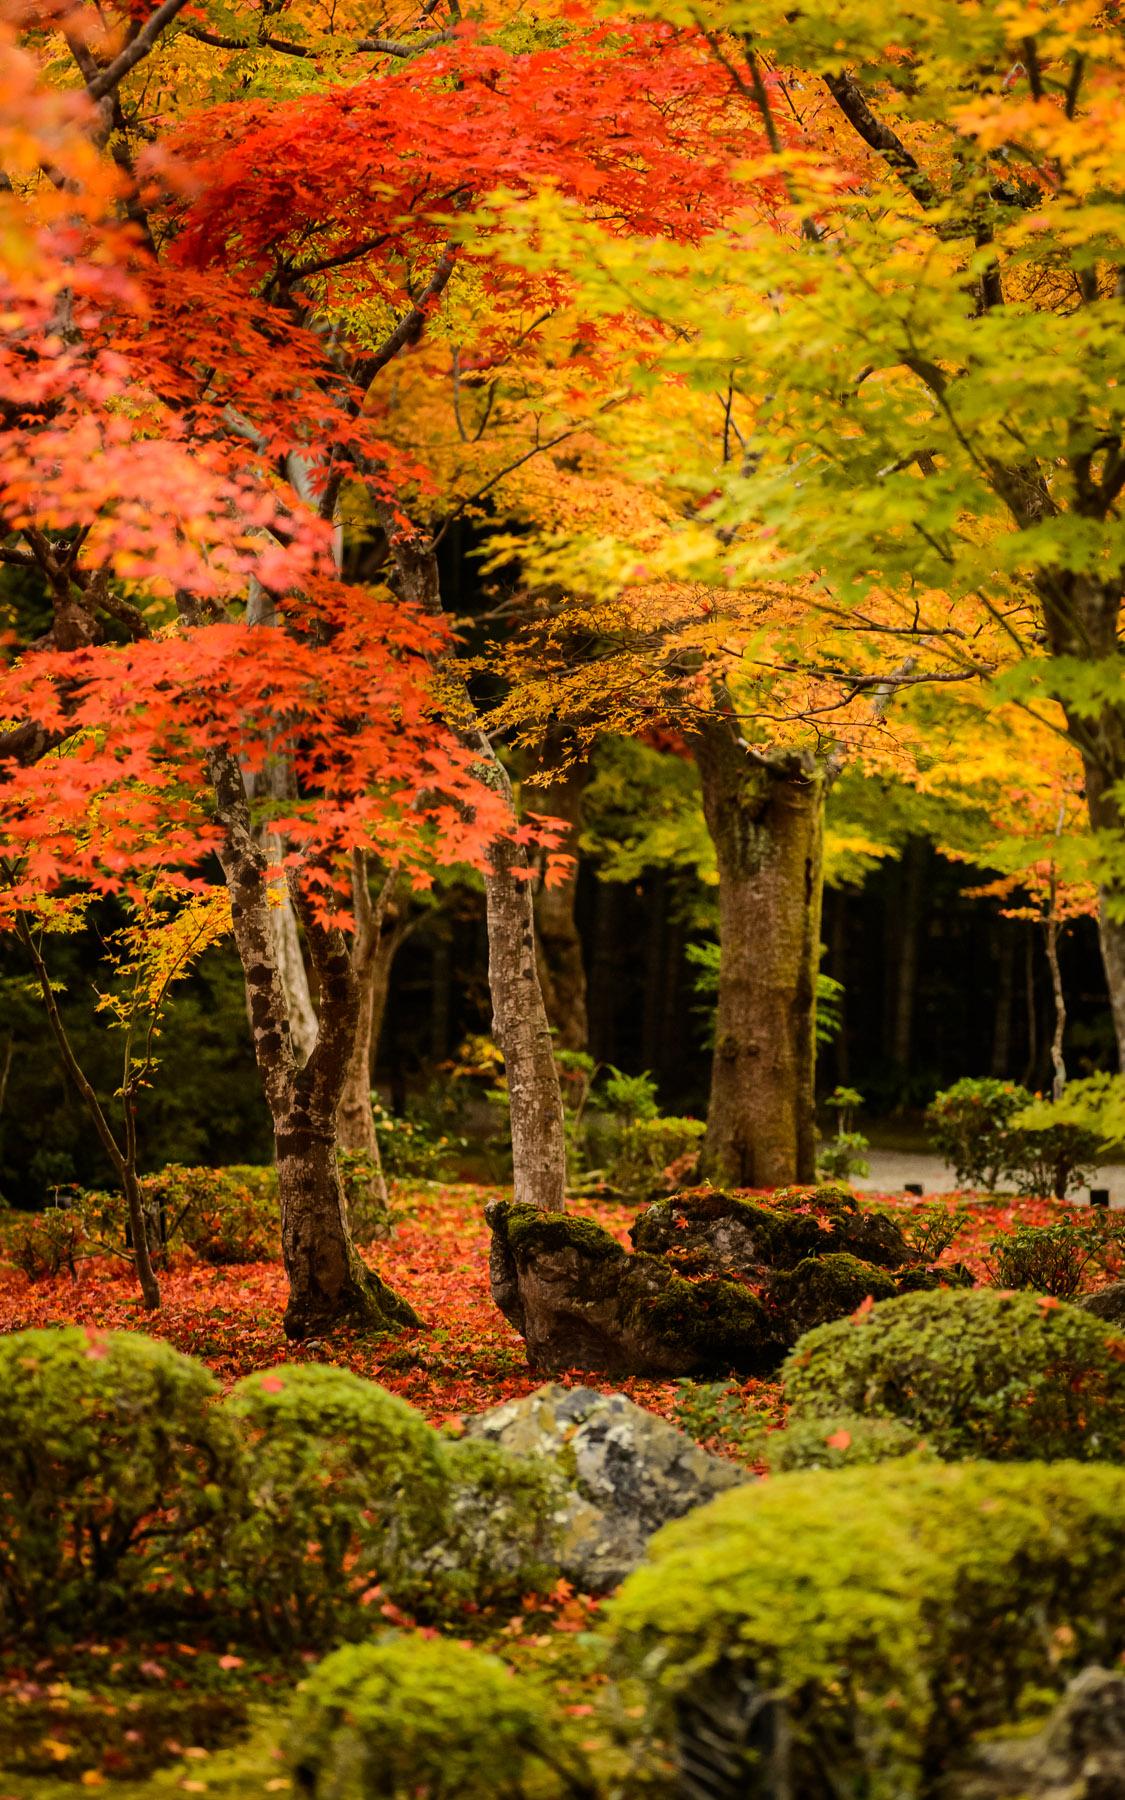 Jeffrey Friedl S Blog 187 The Gorgeous Enkouji Temple Of